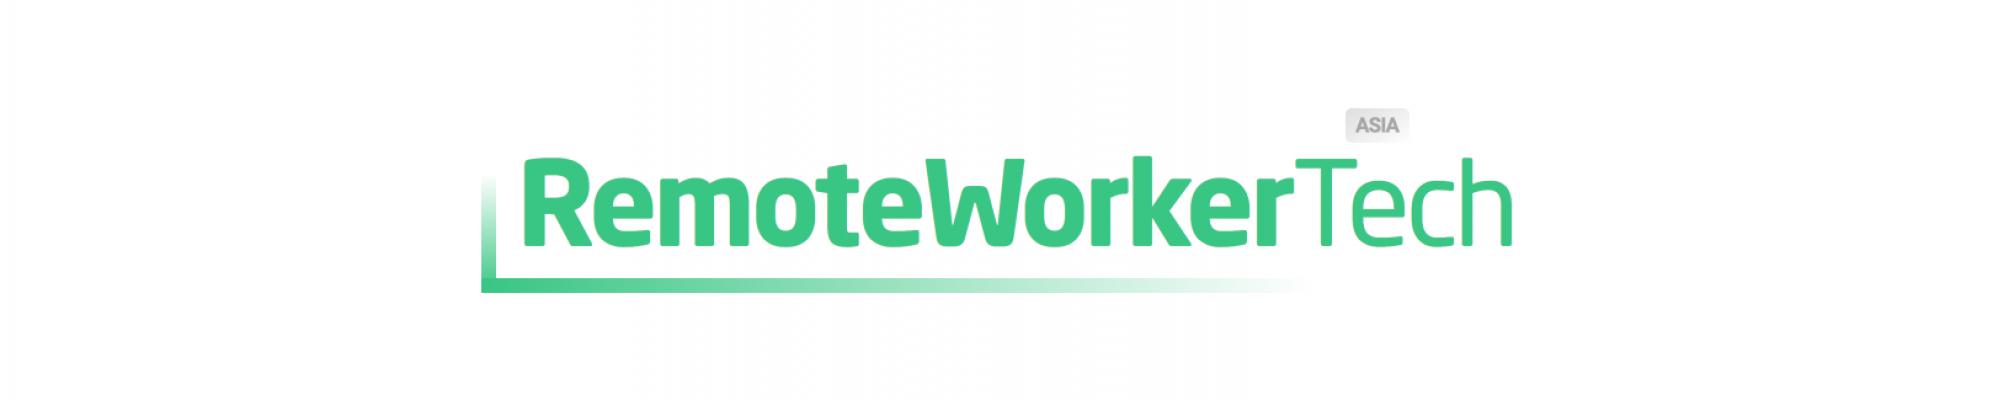 RemoteWorker Tech Logo - Asia